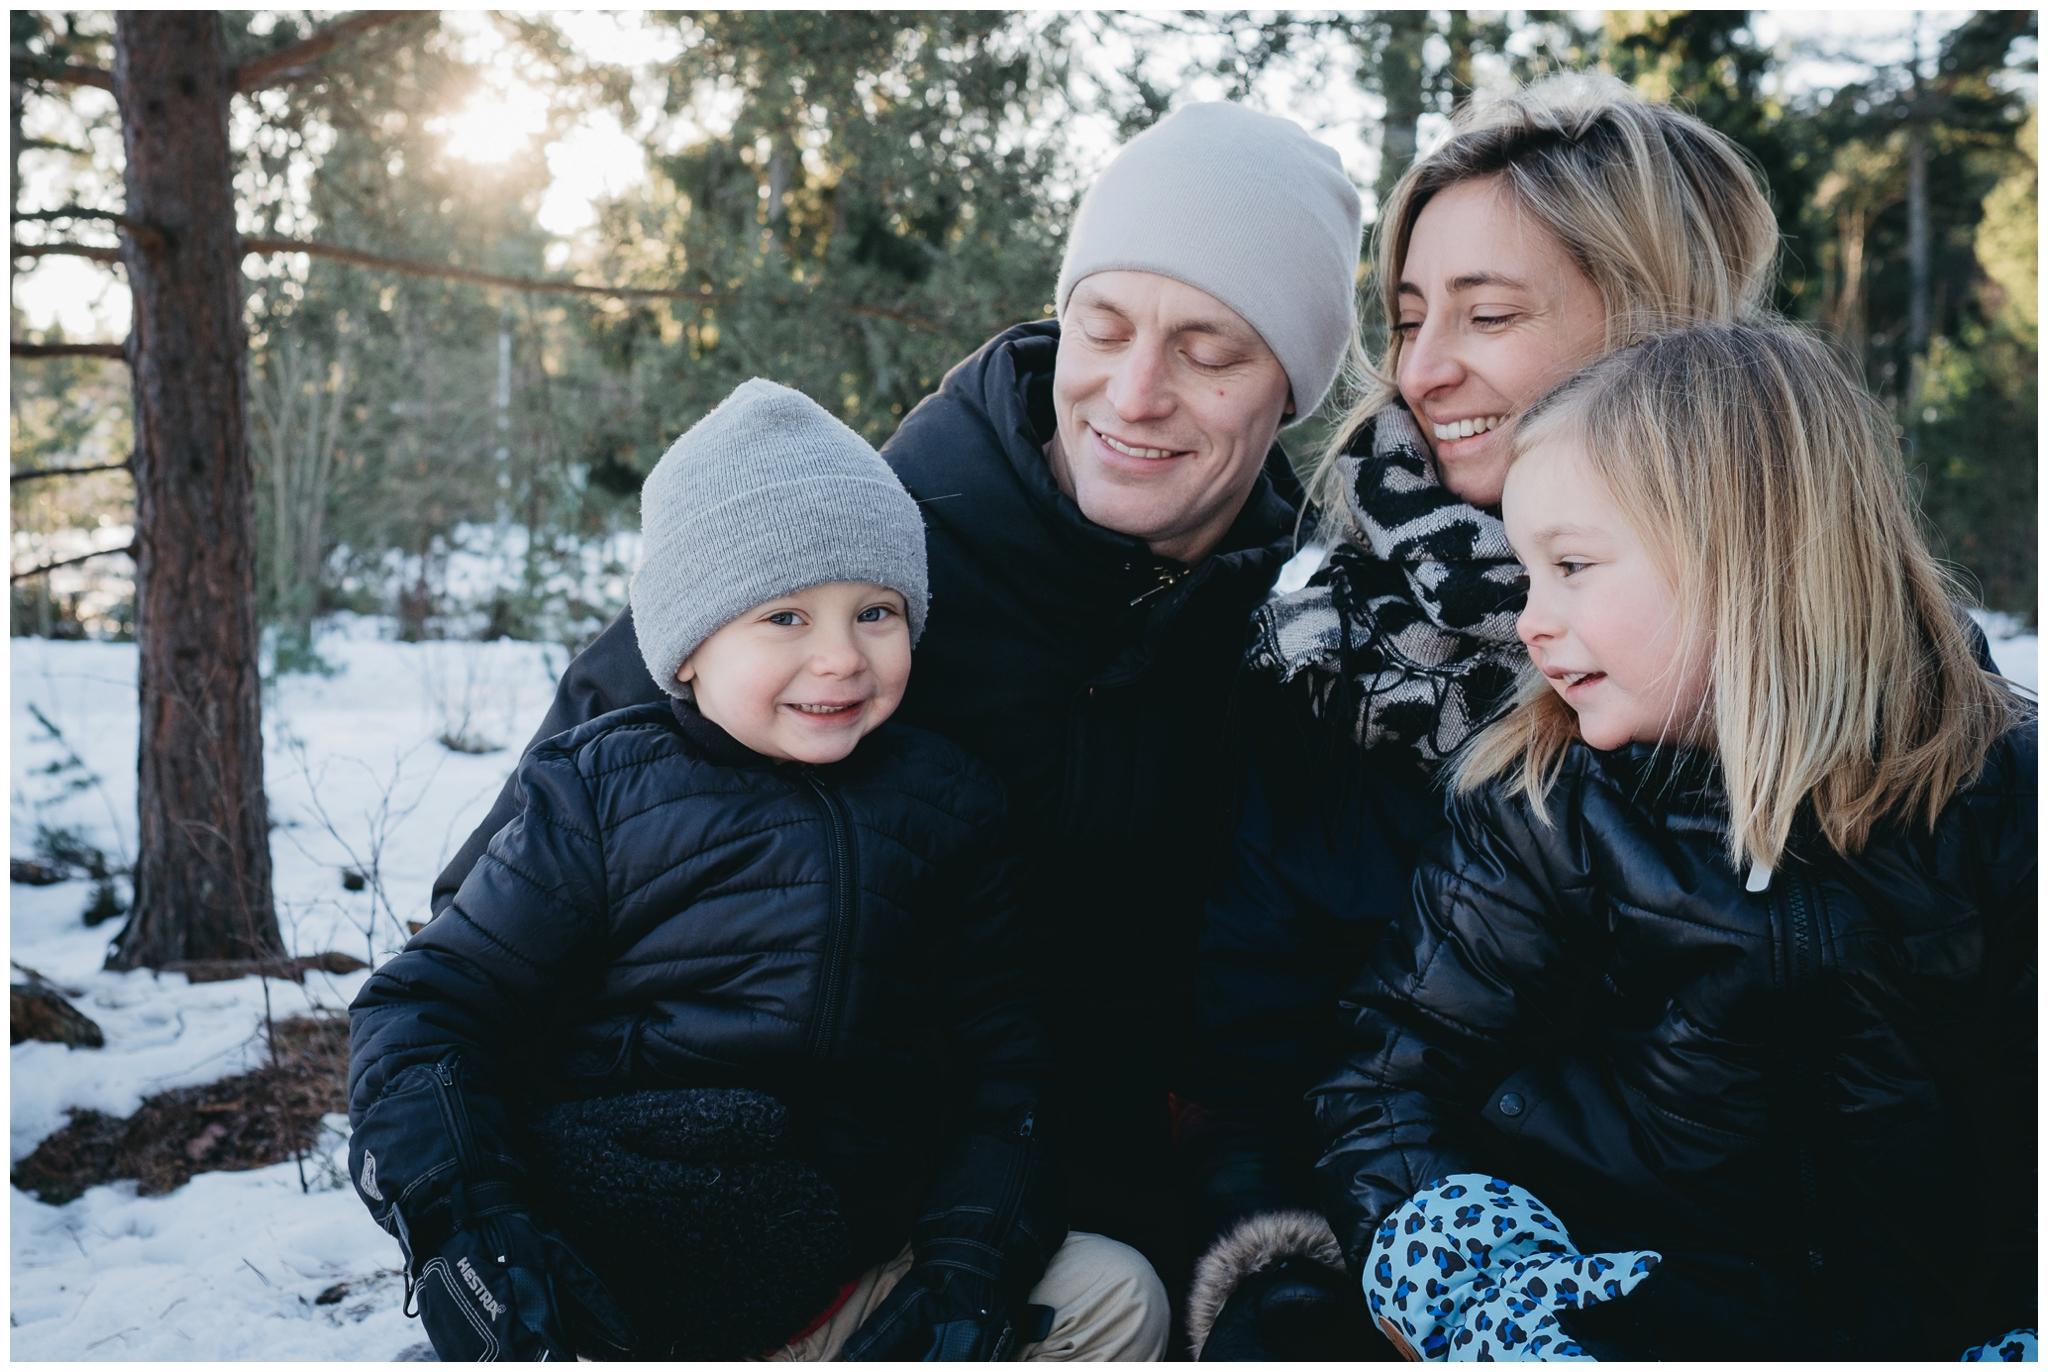 familjefotograf-stockholm-vallentuna-cecilia-pihl-linda-rehlin-24.jpg